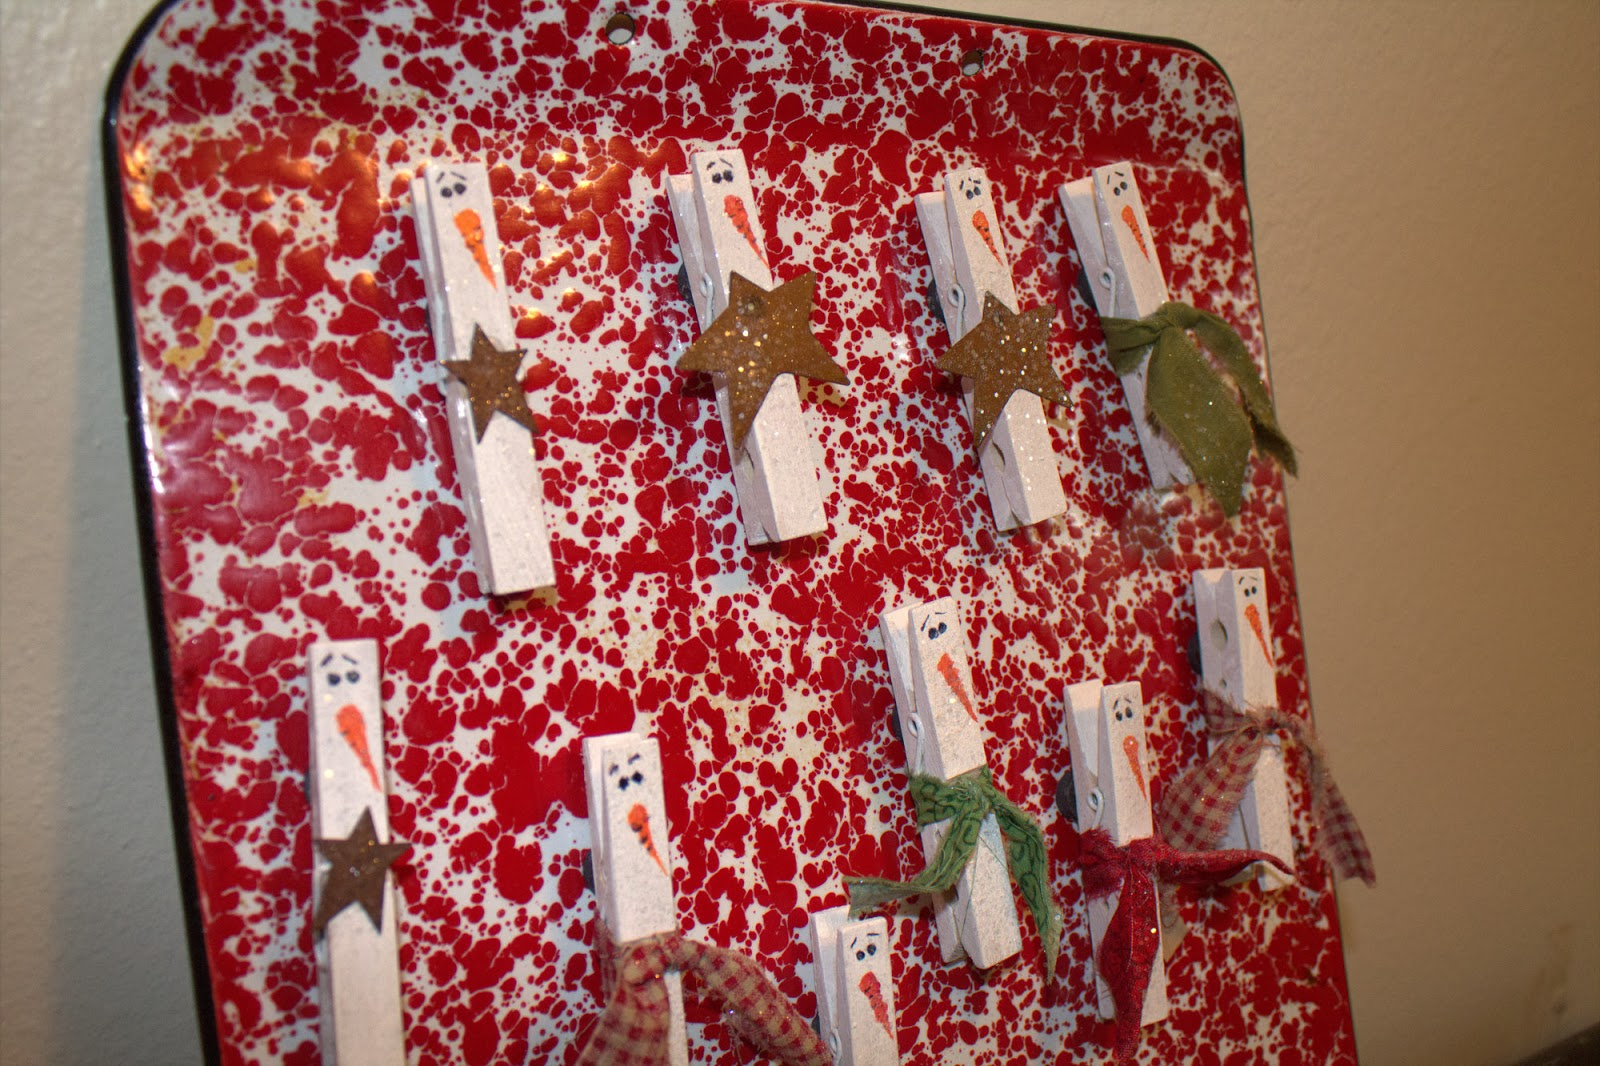 Christmas Crafts To Sell At Bazaar : Holiday craft bazaars minecraft news hub